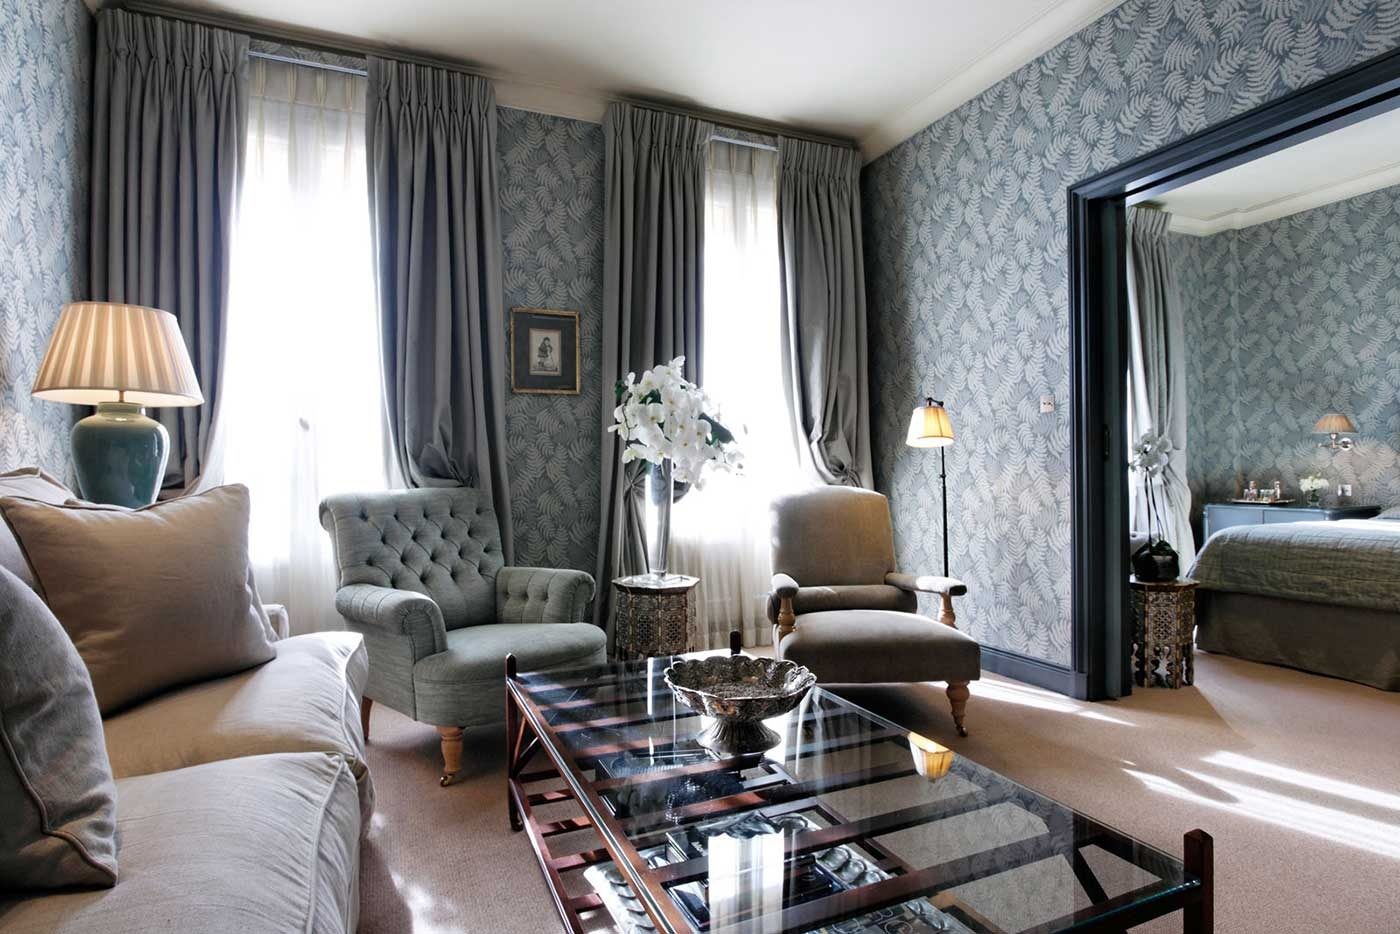 hotel_daniel_5_jpg_1437334626